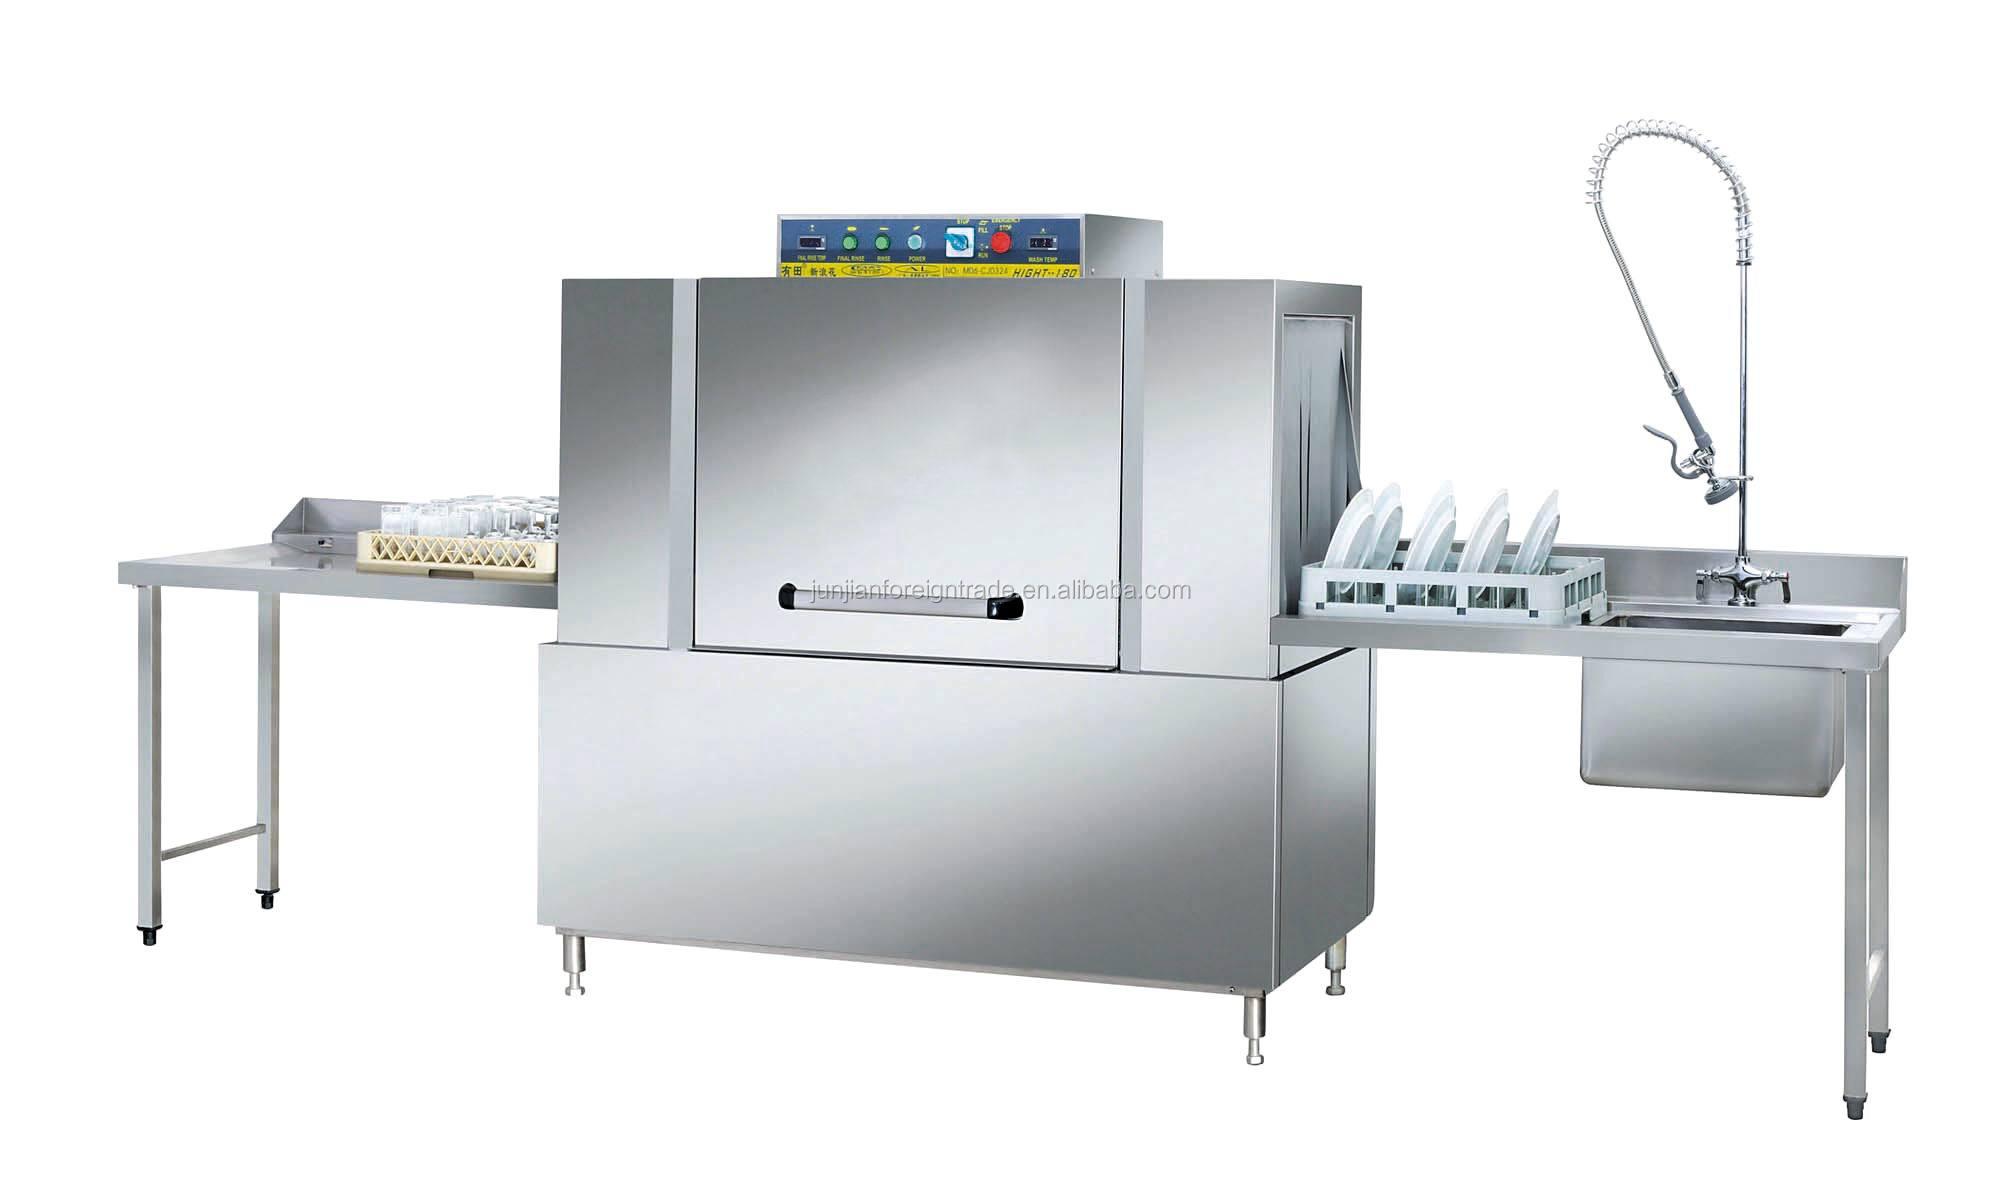 Commercial Kitchen Equipment Product ~ Kitchen equipment dishwasher dish washing machine